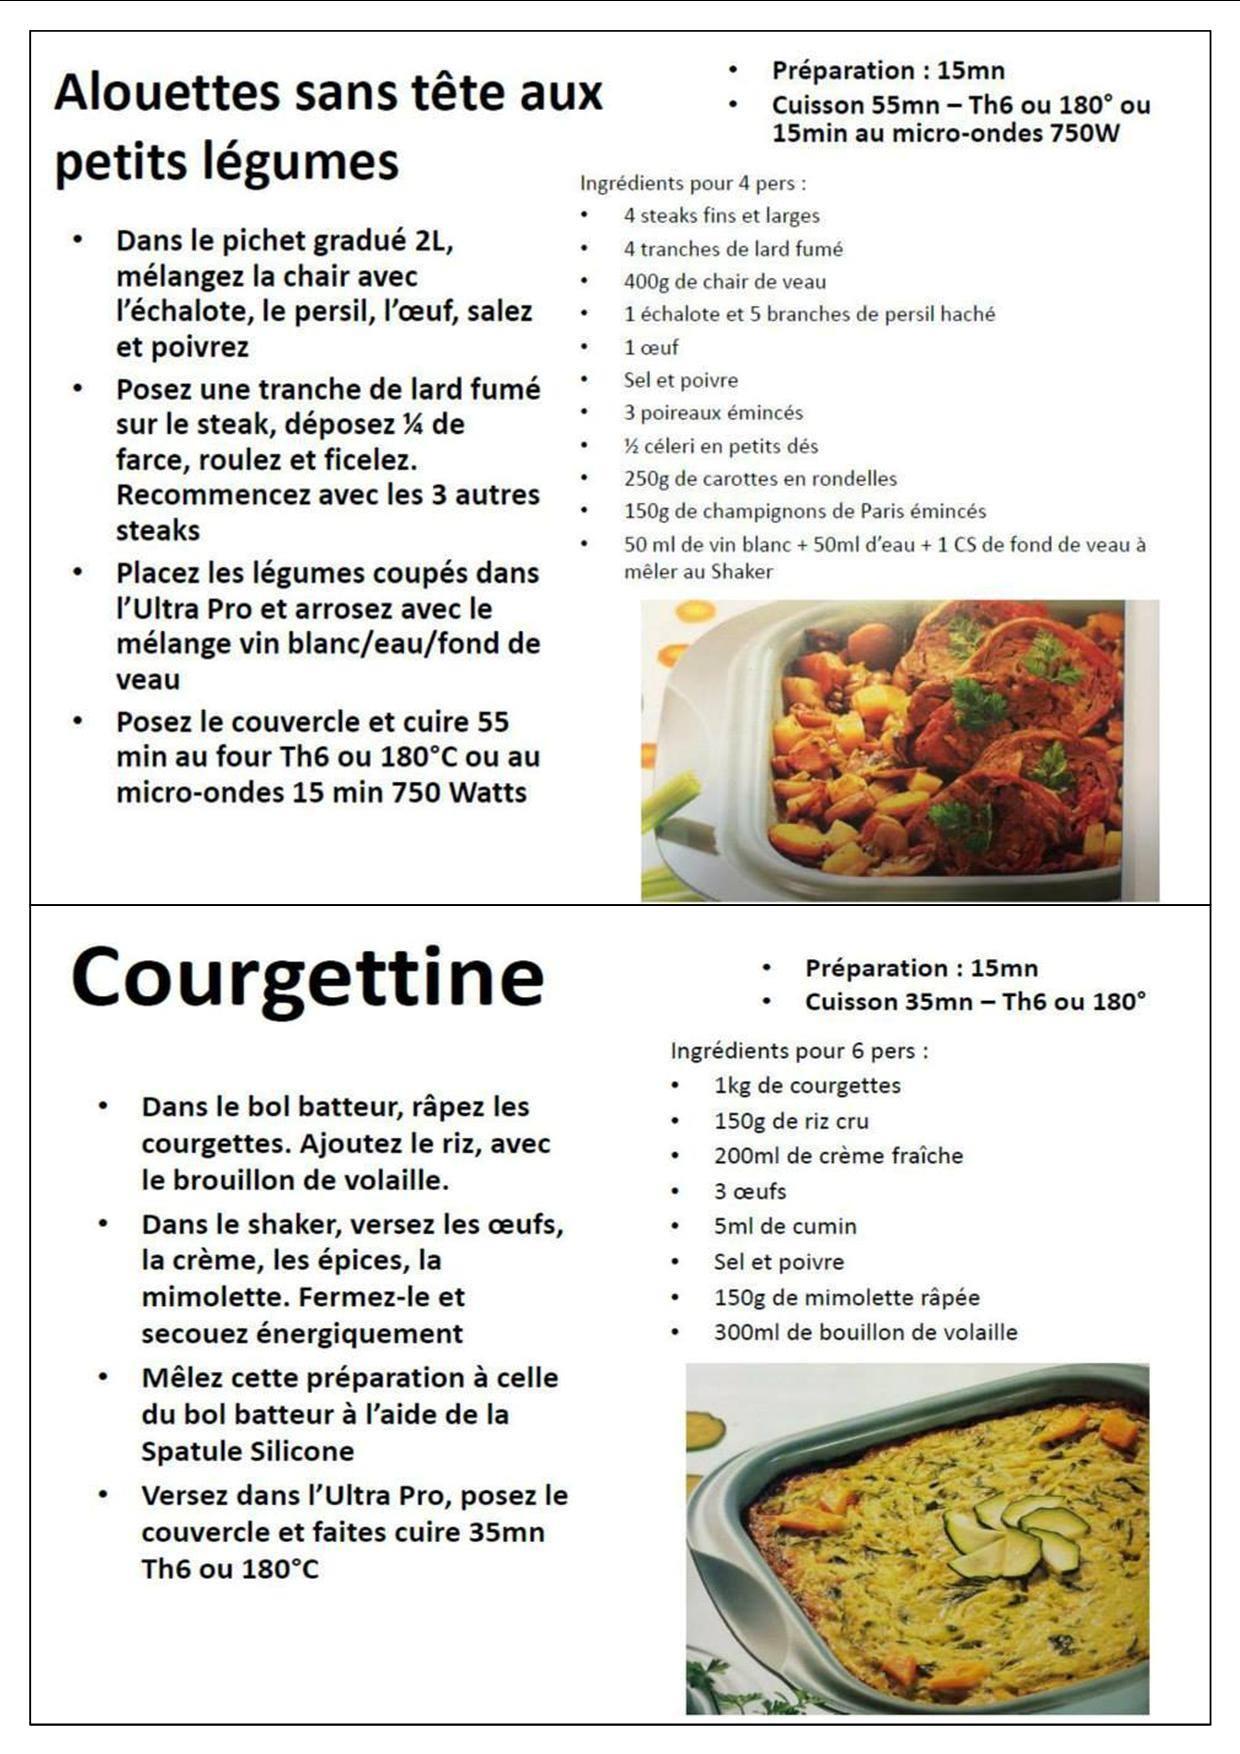 Recette courgette ultra pro tupperware – Un site culinaire ...